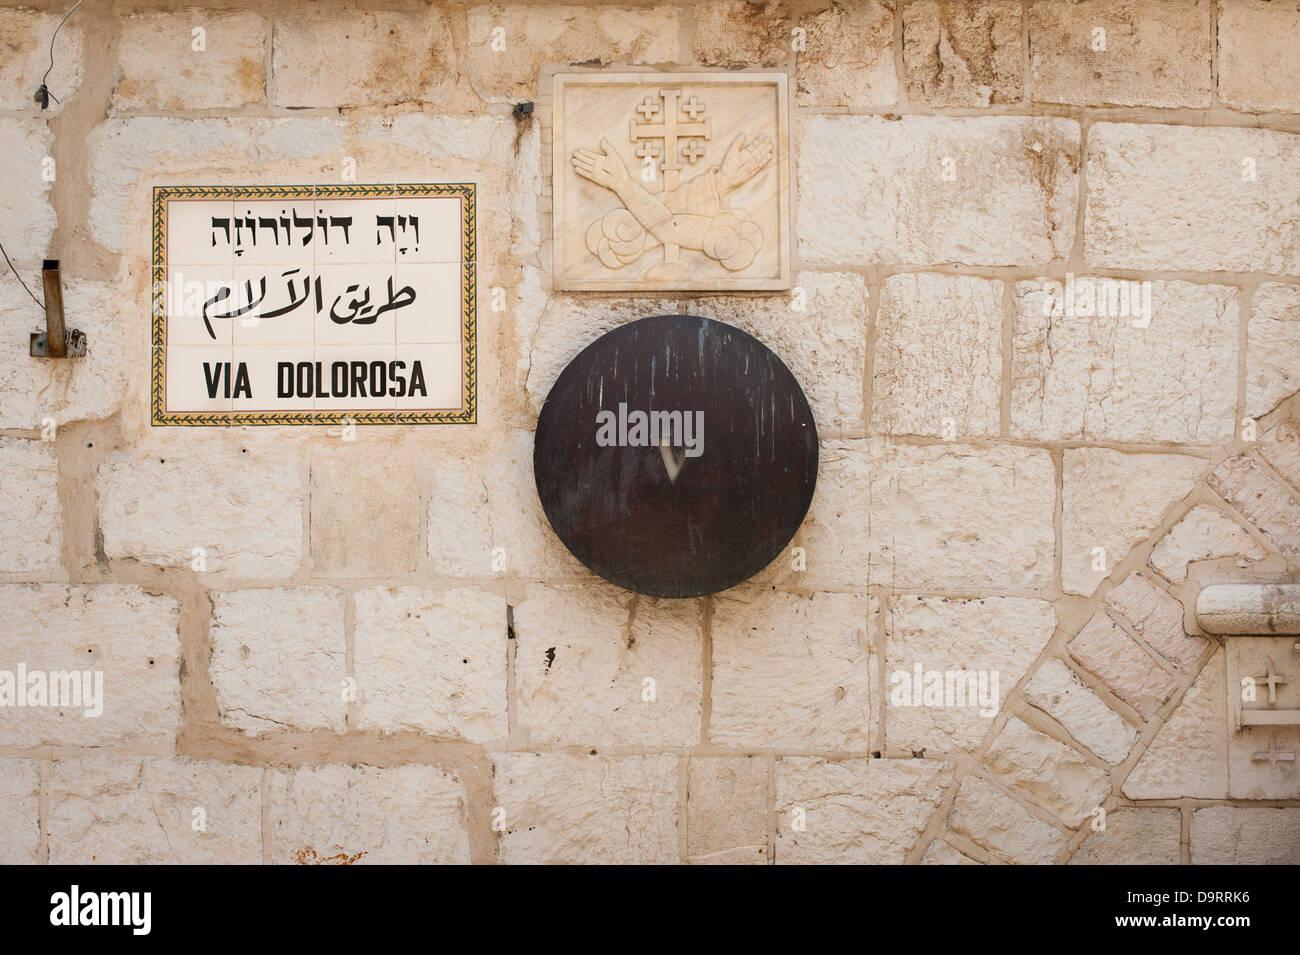 Israel alten Stadt Jerusalem Via Dolorosa Kreuzweg 5 fünf fünfte Simon von Zyrene hilft Jesus Kreuz tragen Stockbild